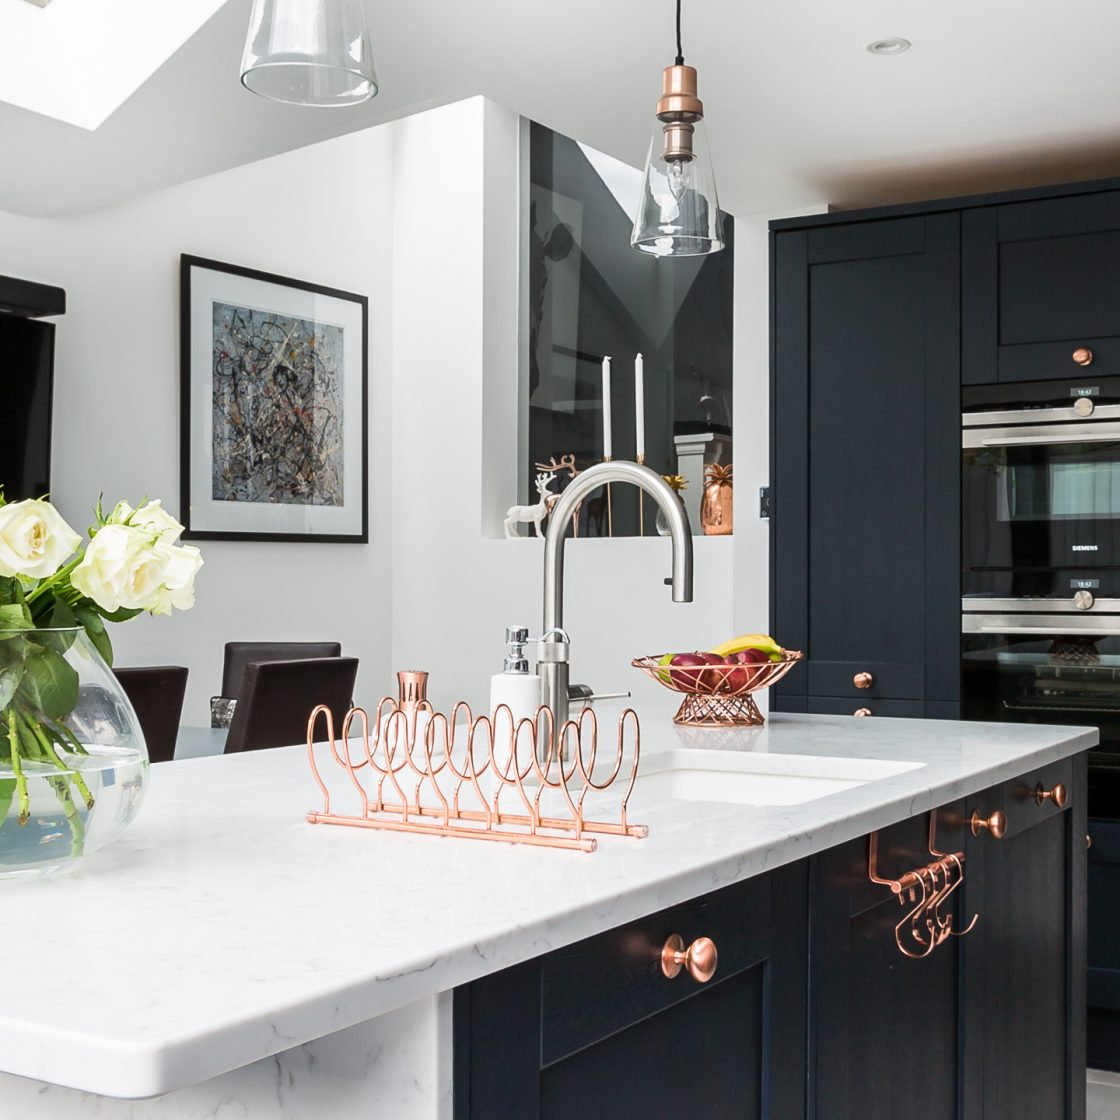 Plus Rooms Kitchen Extension, LandellsRoad, SE22-5